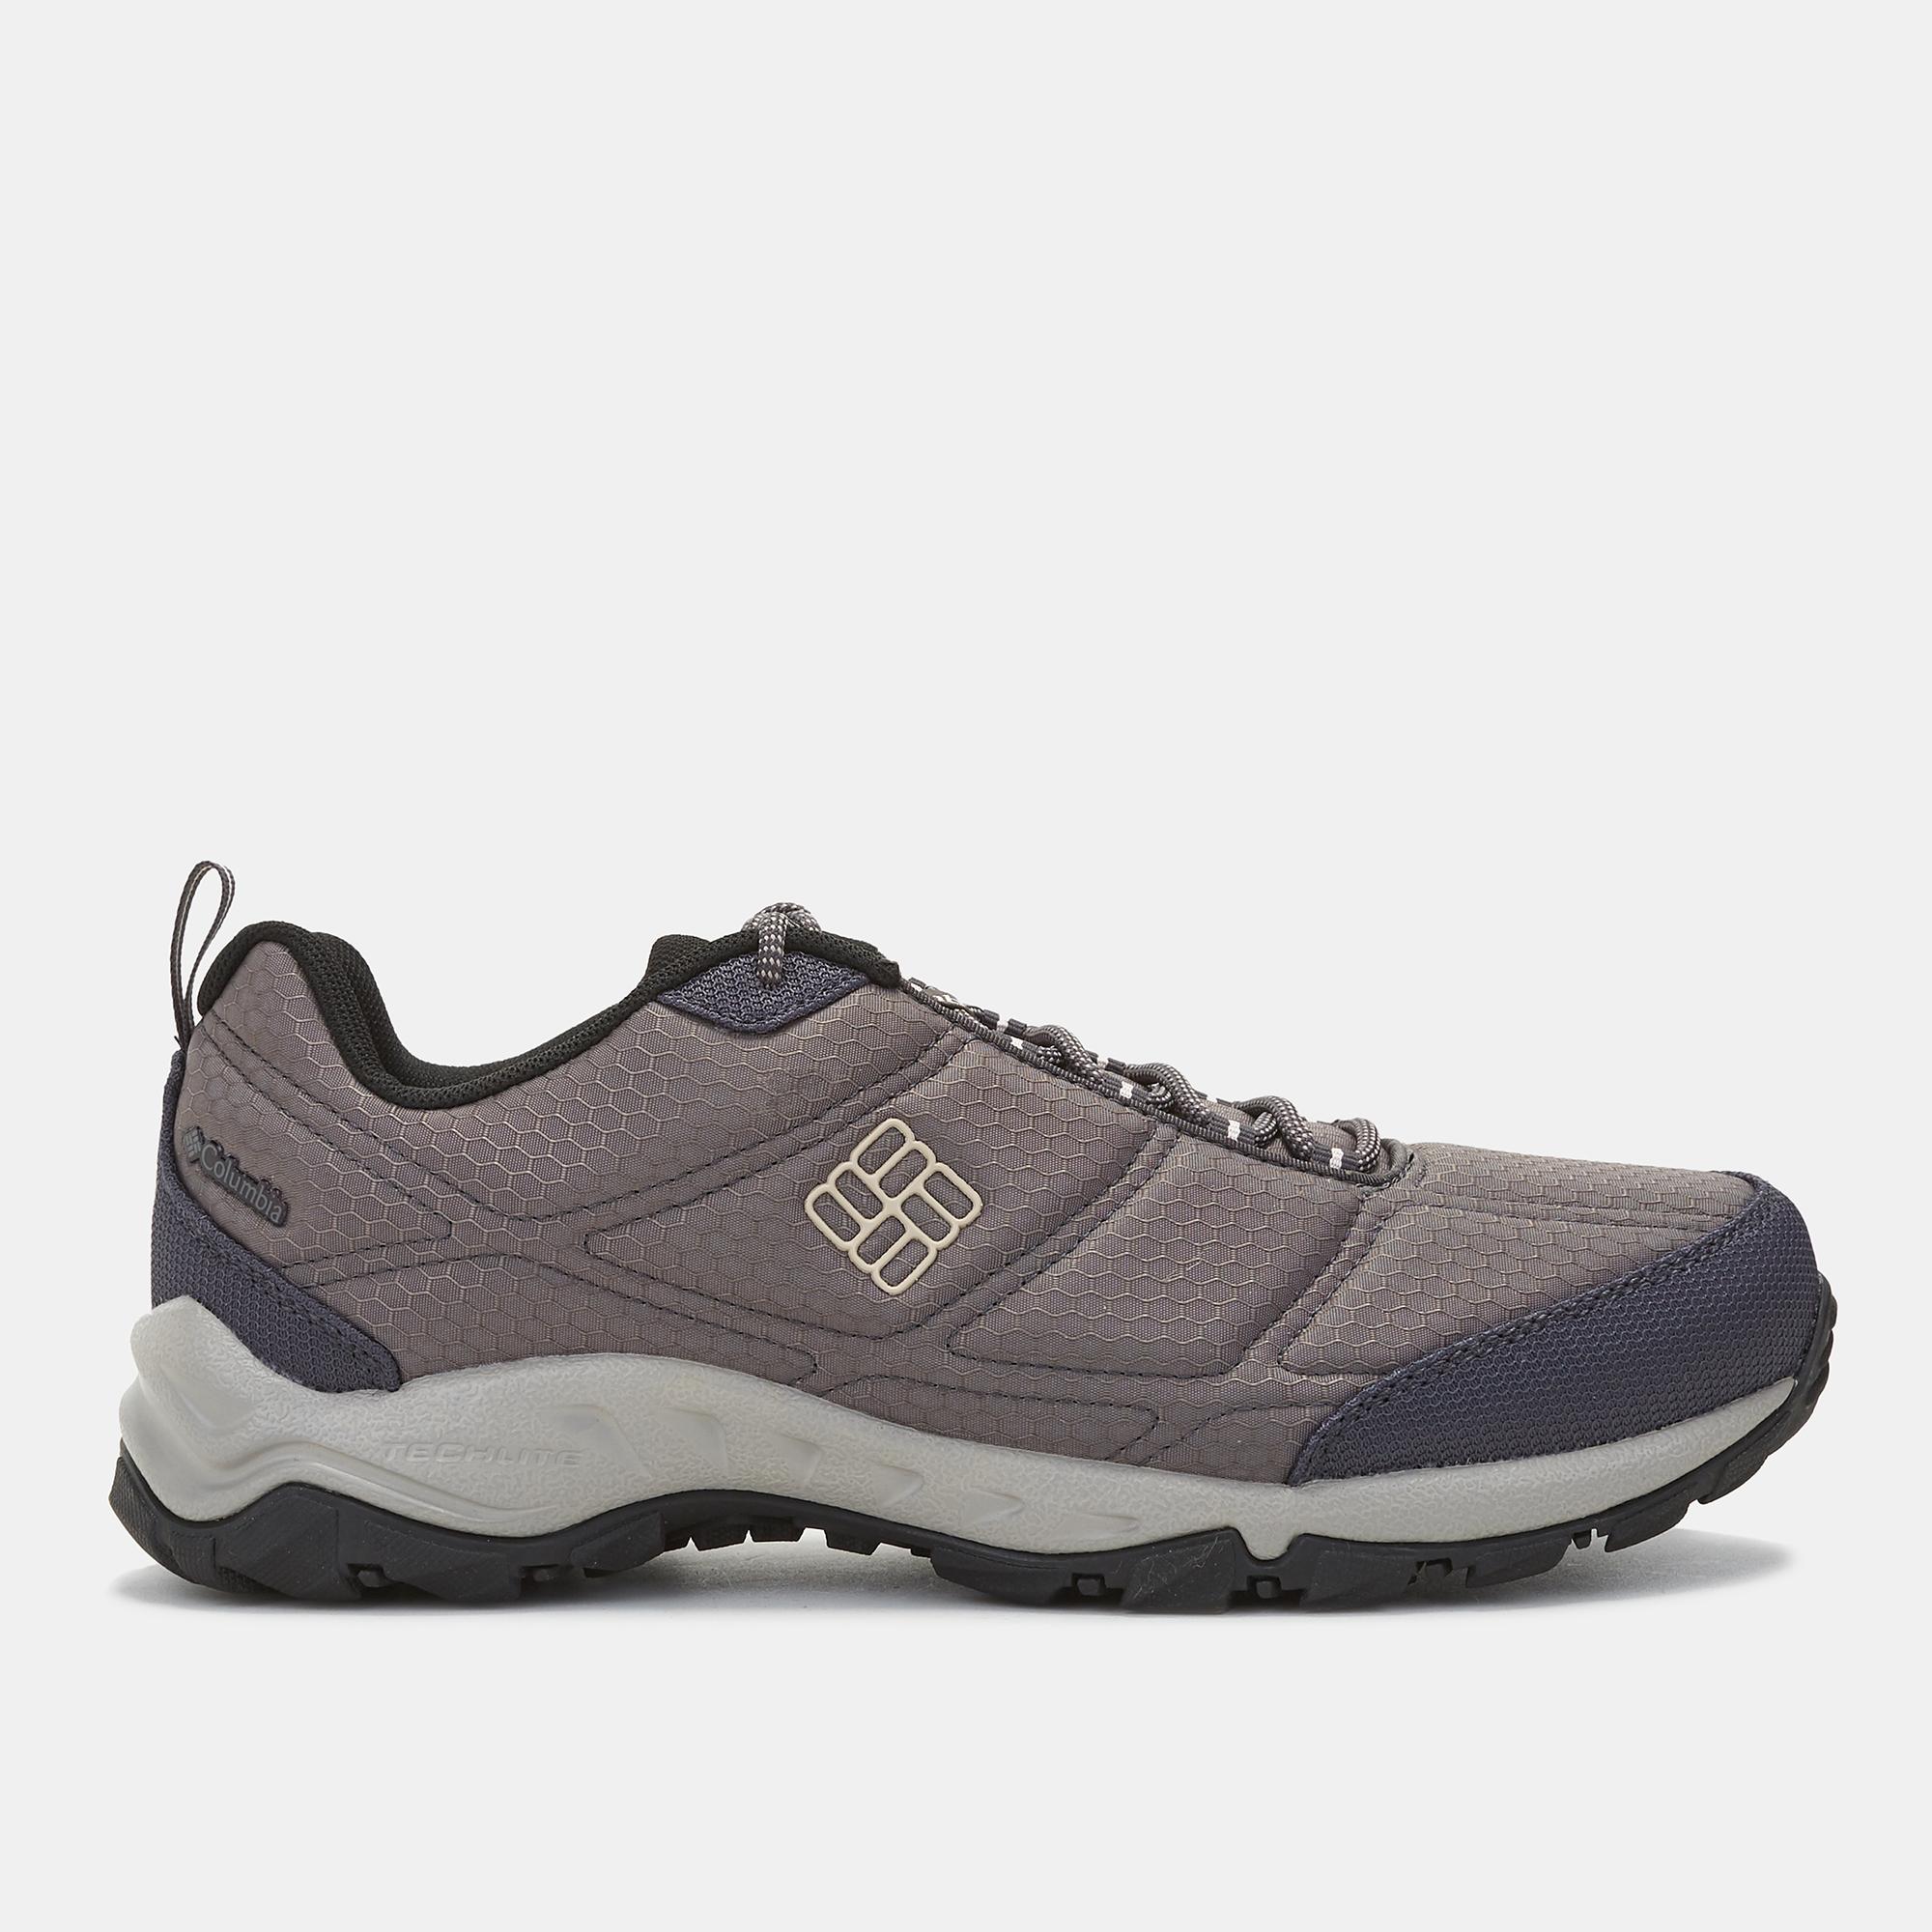 ee602fdd6881 Columbia firecamp ii waterproof hiking shoe hiking shoes jpg 2000x2000  Columbia tennis shoes for men